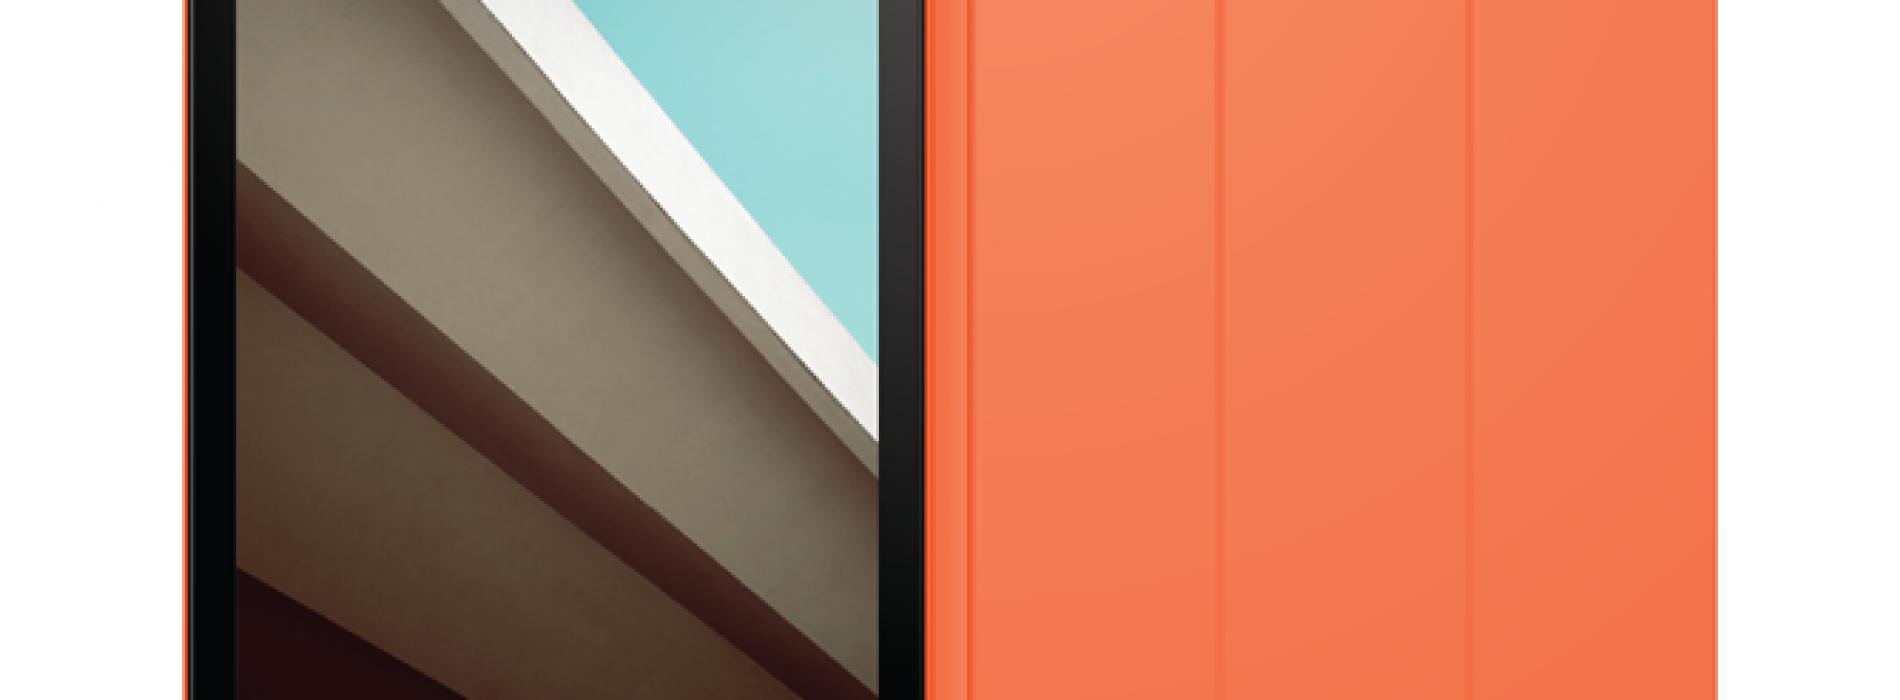 Nexus 9 (HTC Volantis/Flounder) Keyboard and Smart Cover leak